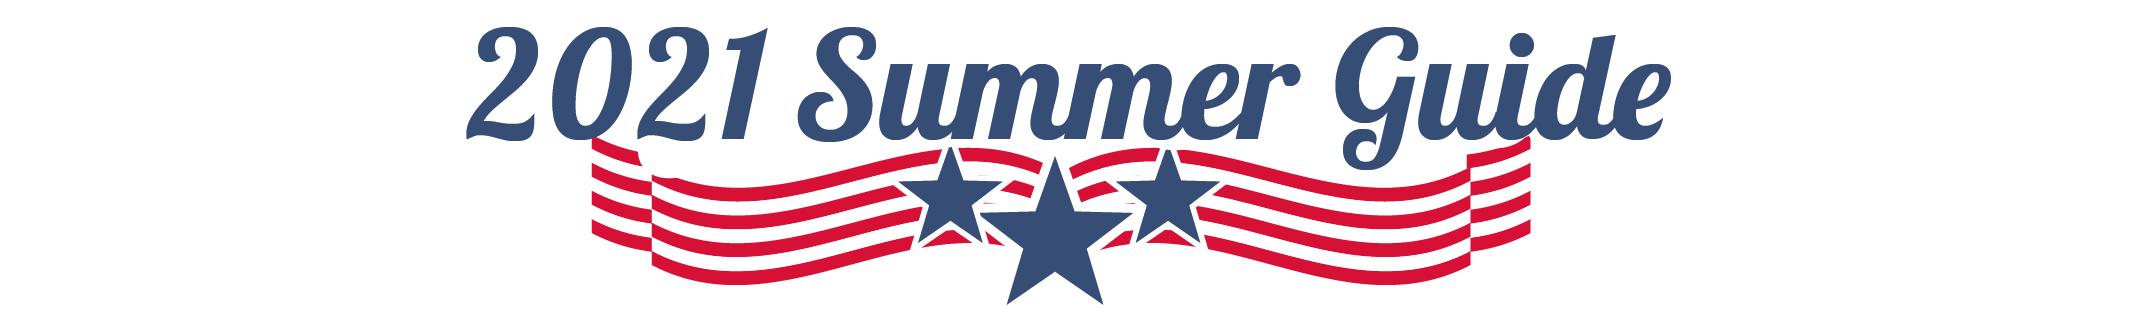 SummerGuide2021